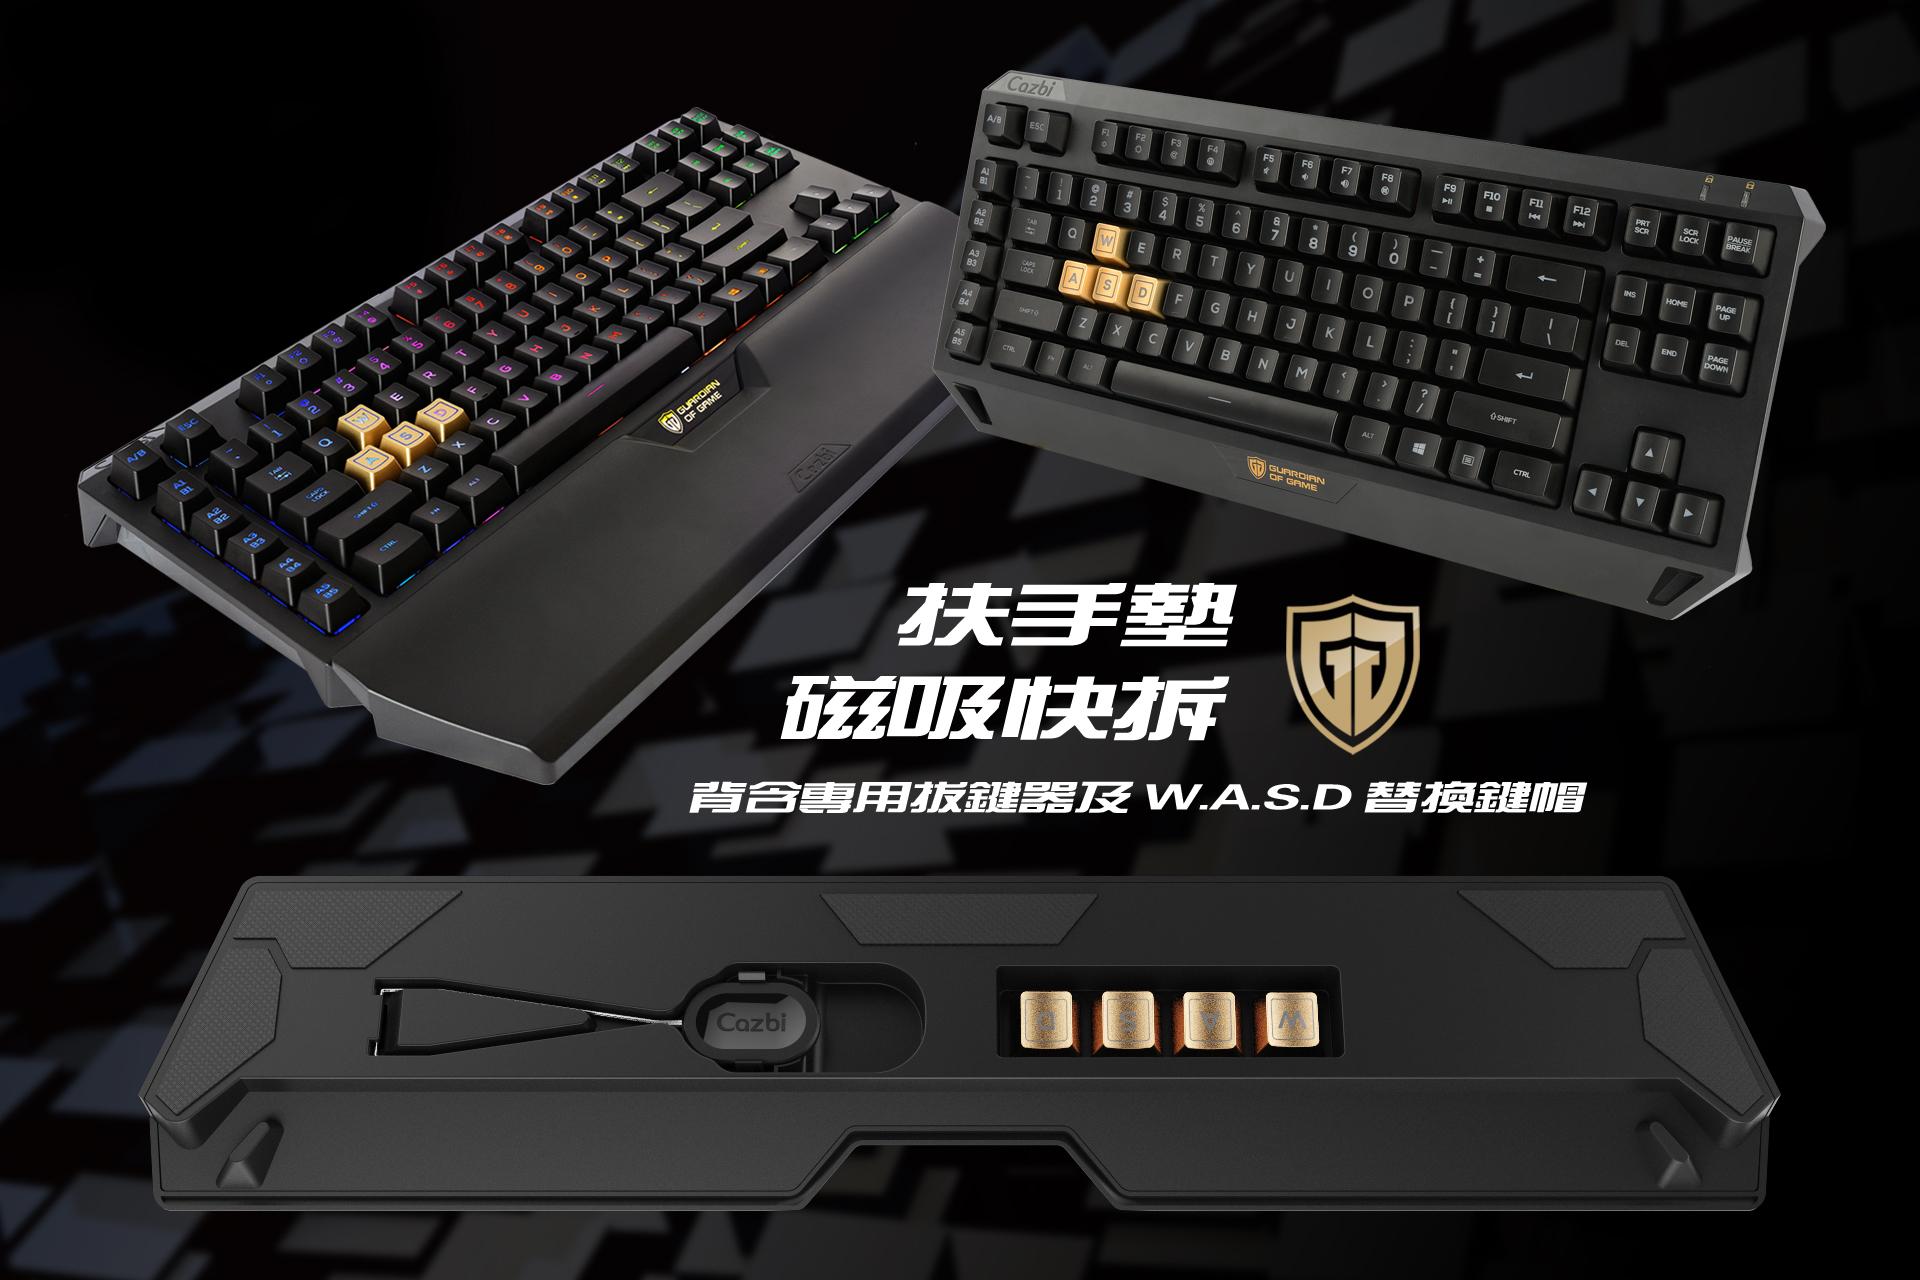 Cazbi T90U ZINC 極競客機械式鍵盤